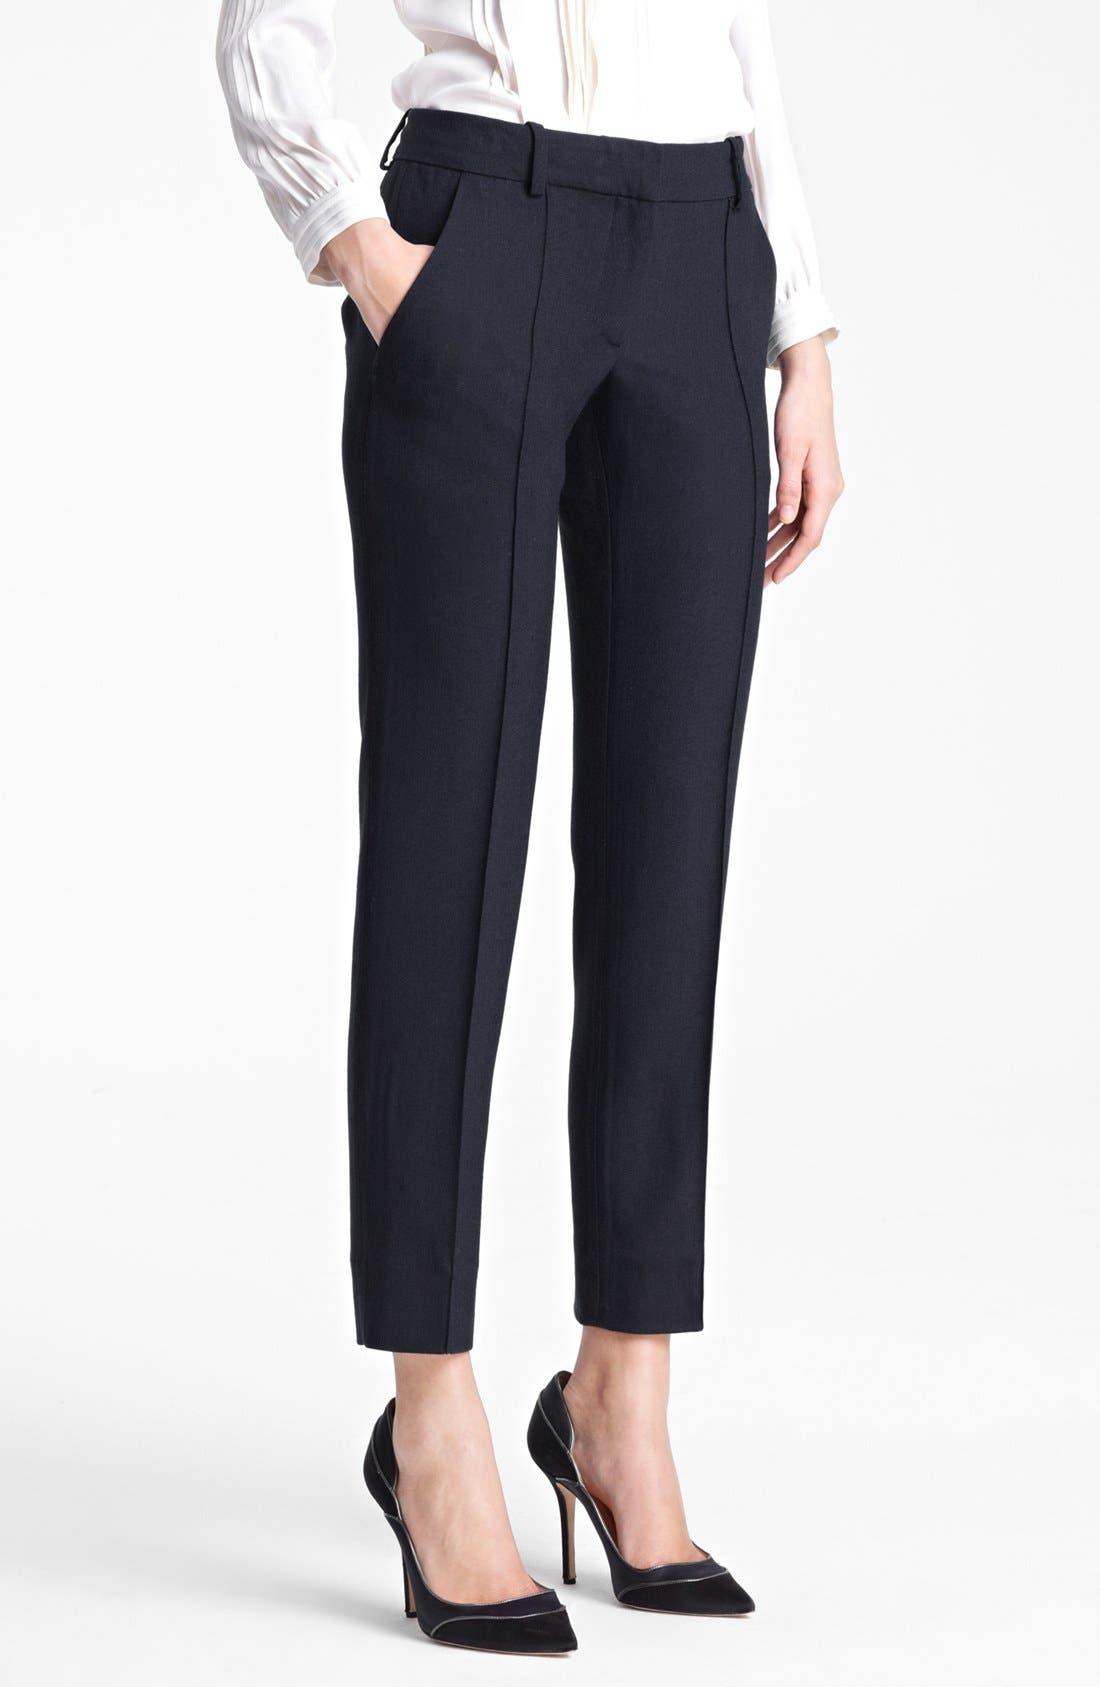 Alternate Image 1 Selected - Oscar de la Renta Slim Crop Pants